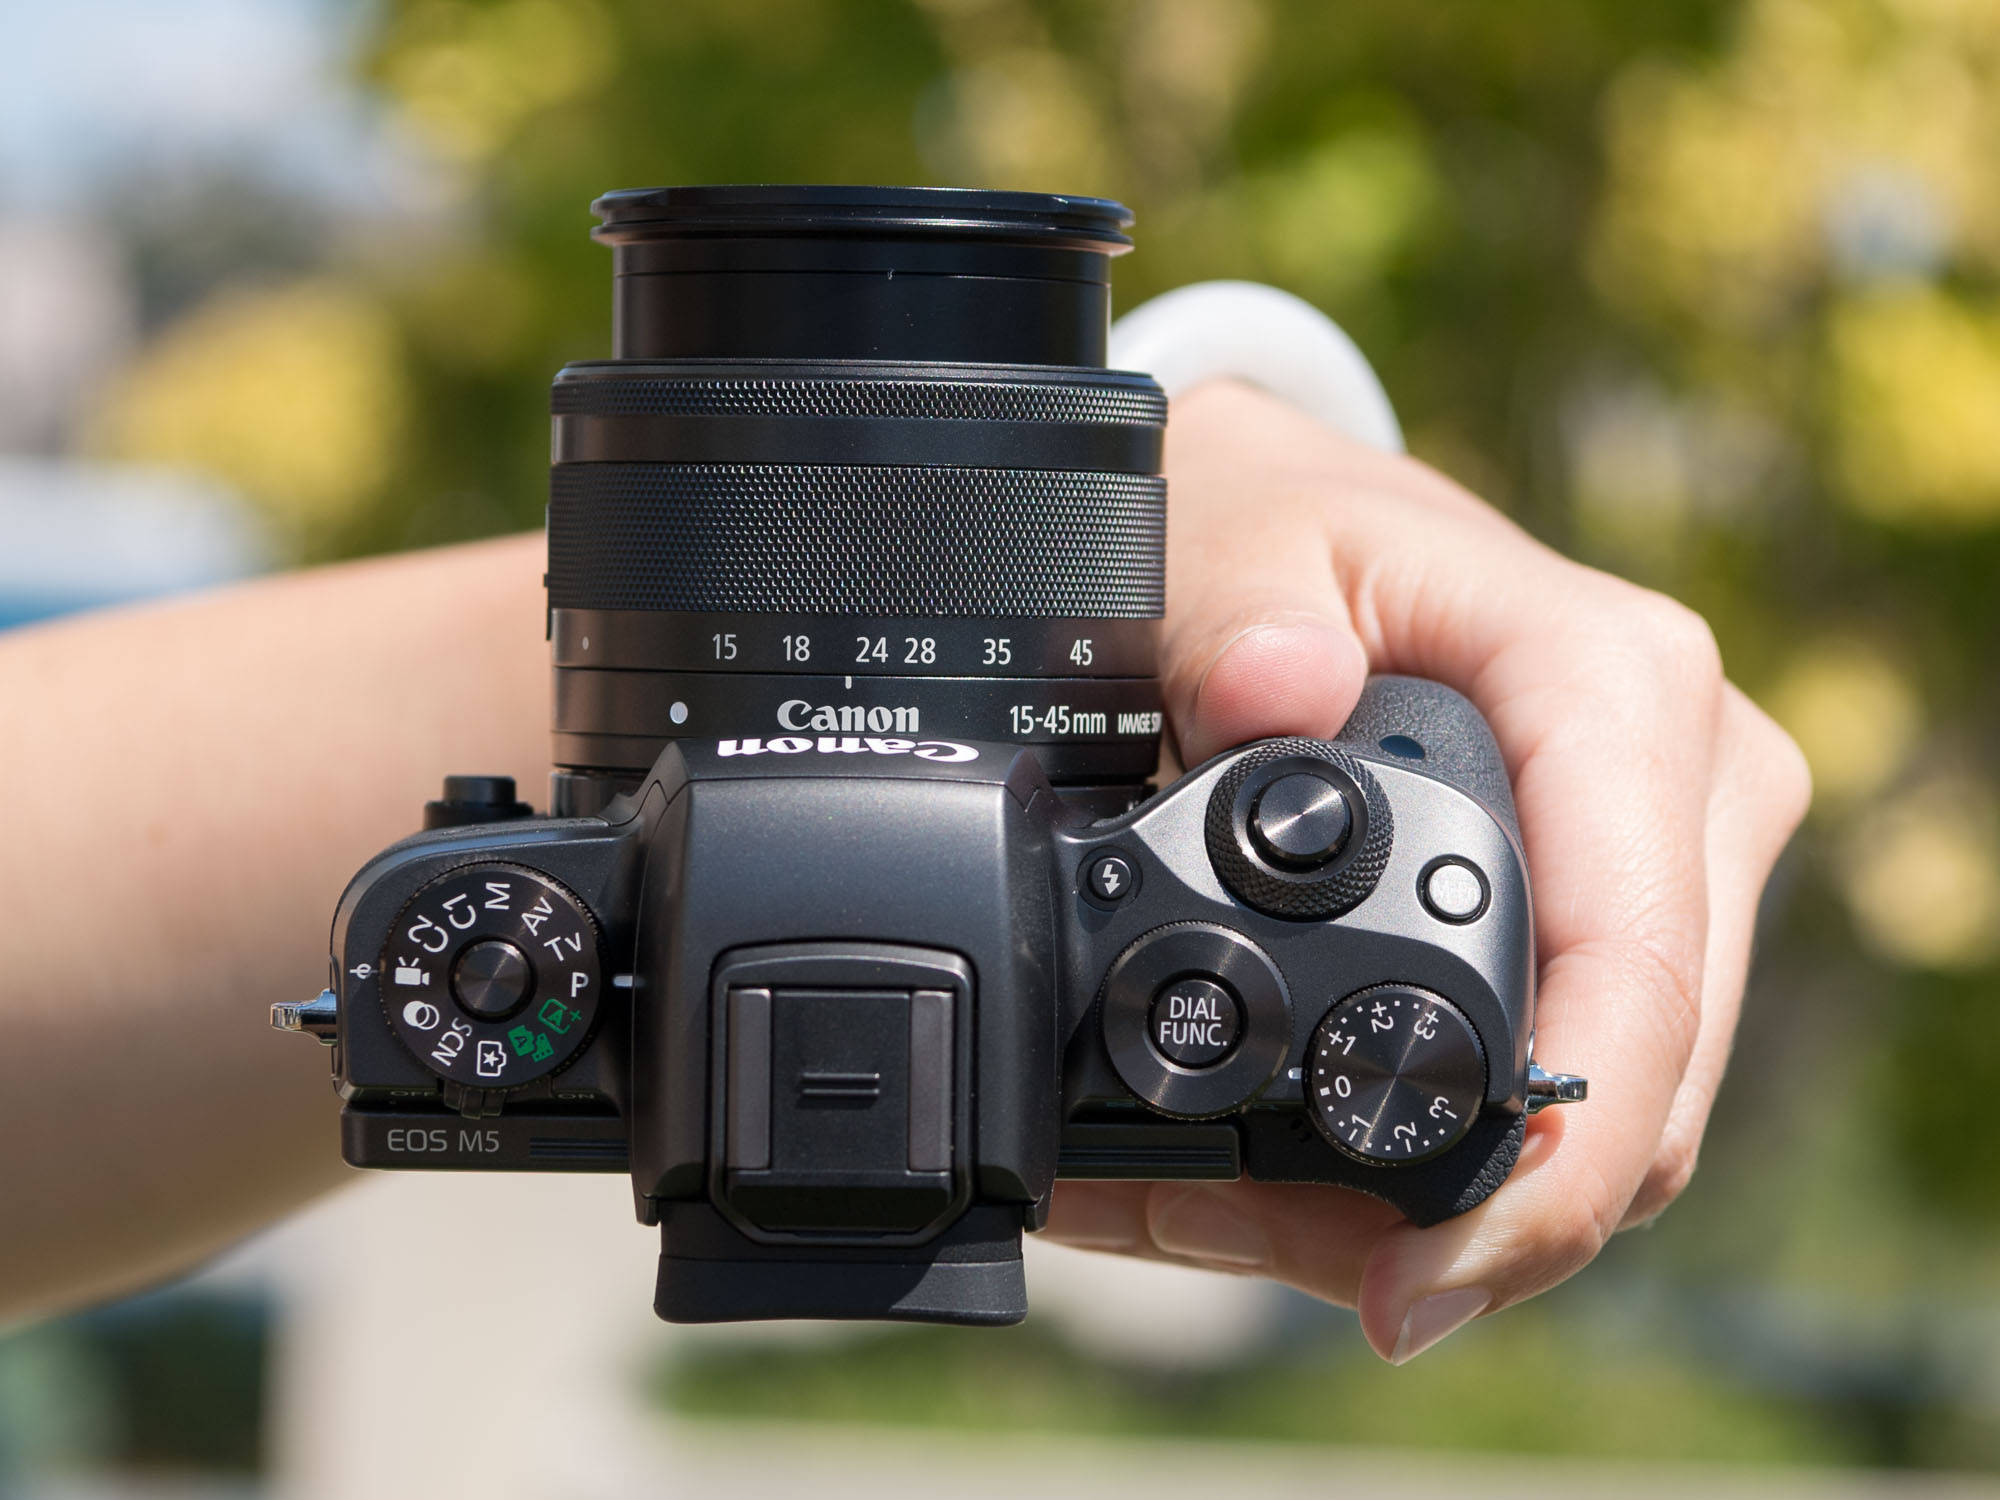 top digital camera review sites